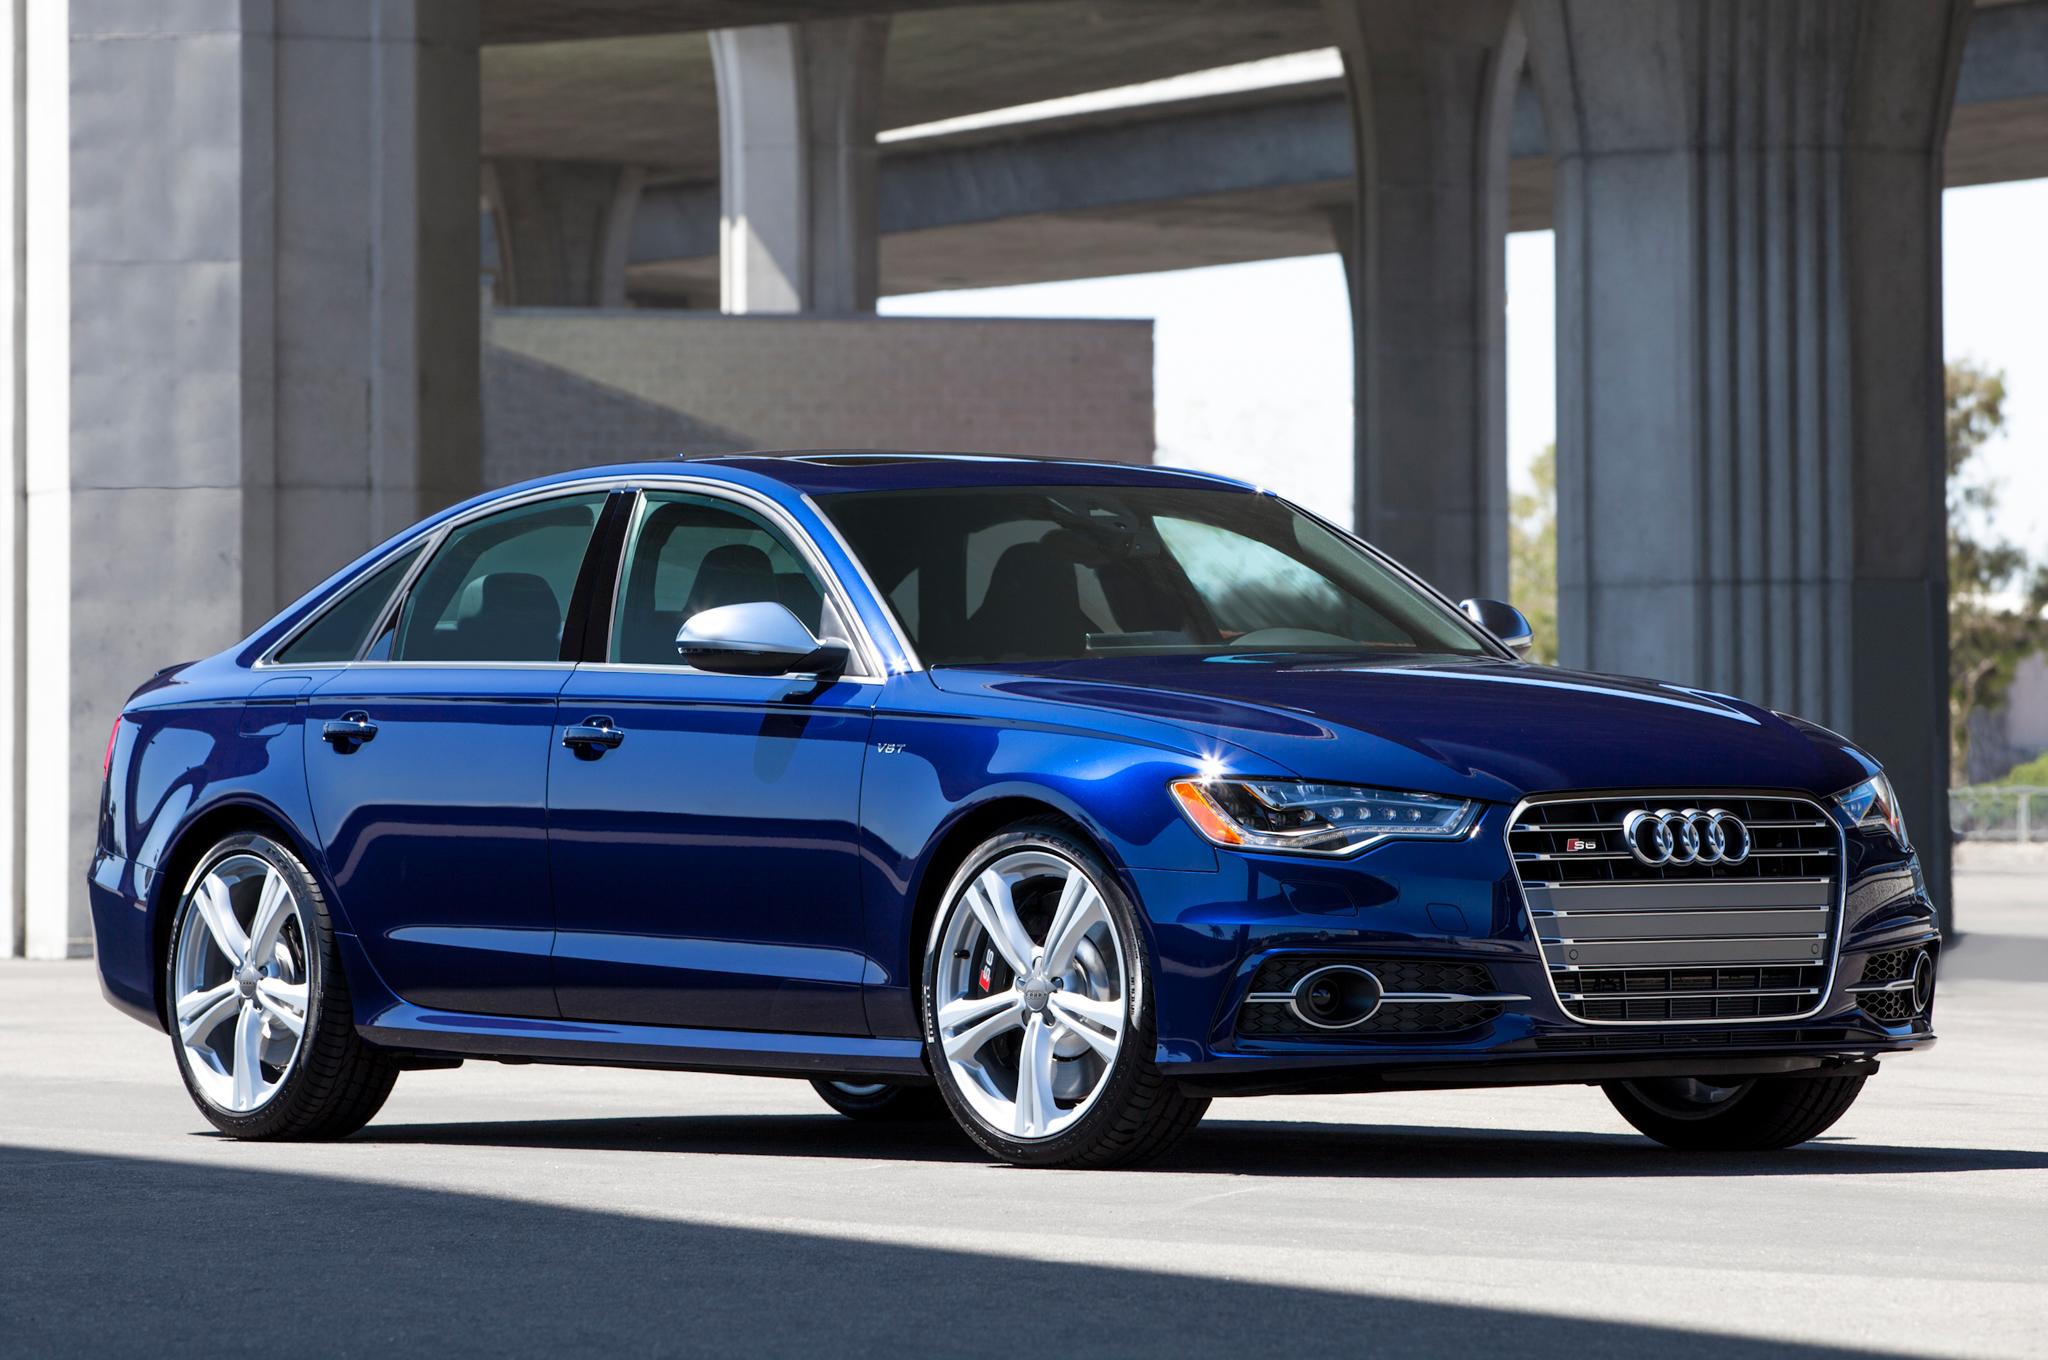 2014 Audi S6 Image 1